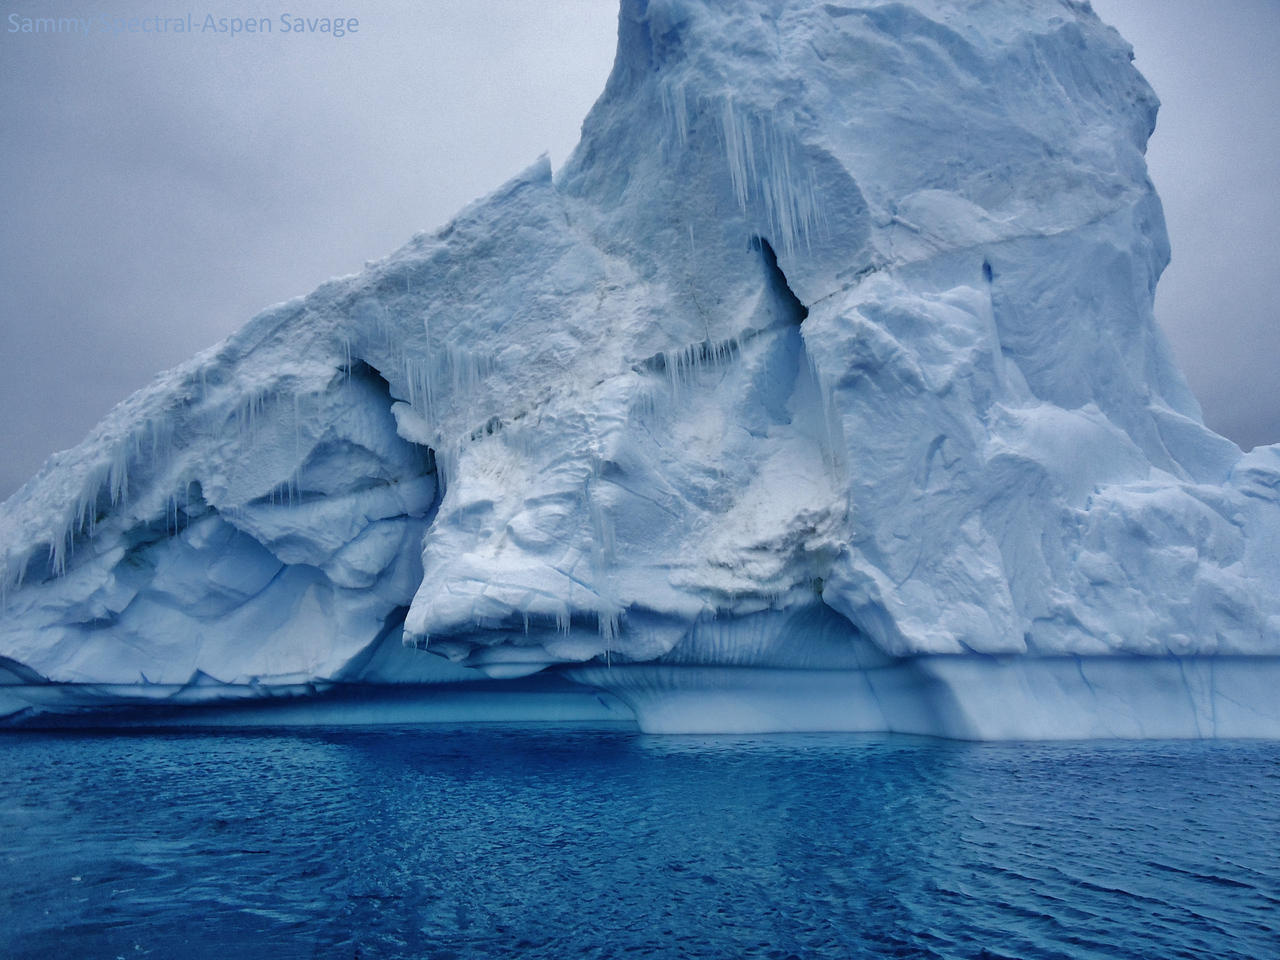 Spire iceberg